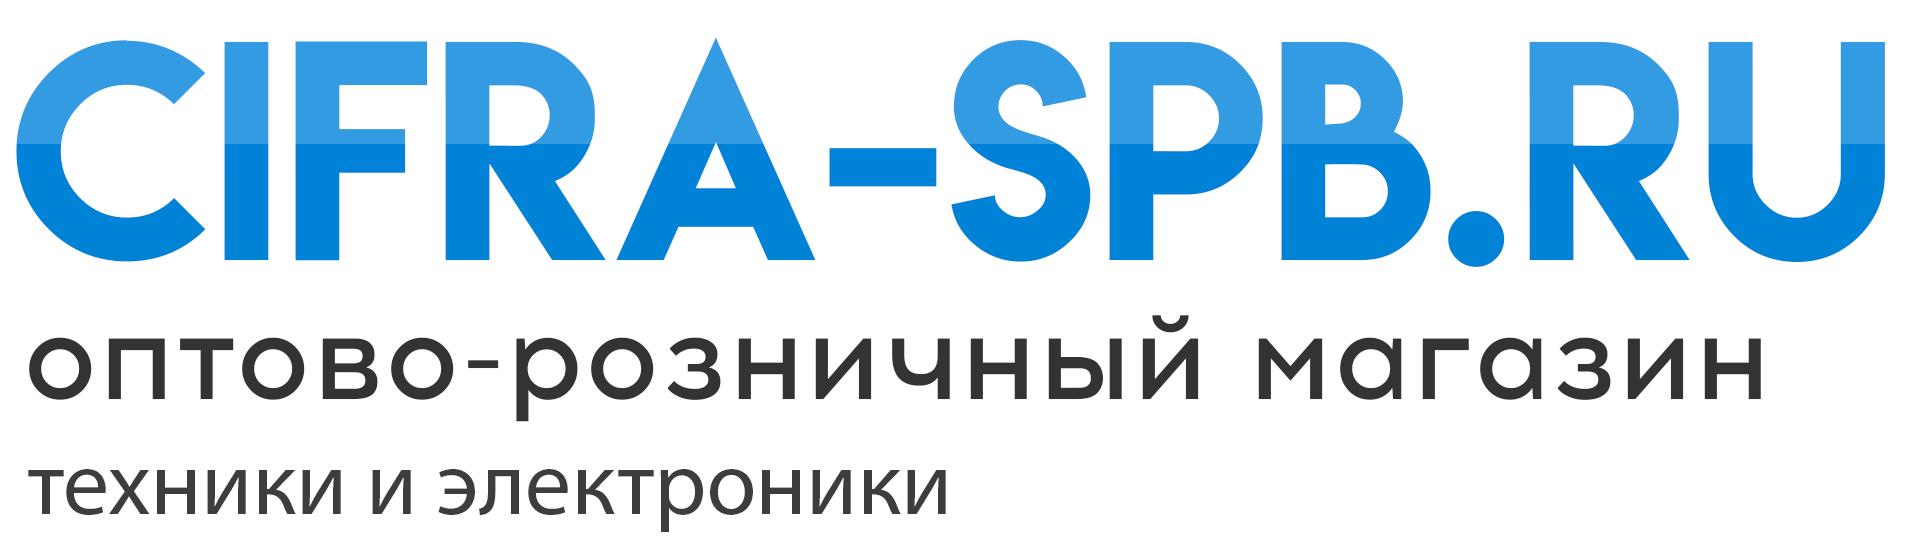 Cifra-Spb.ru